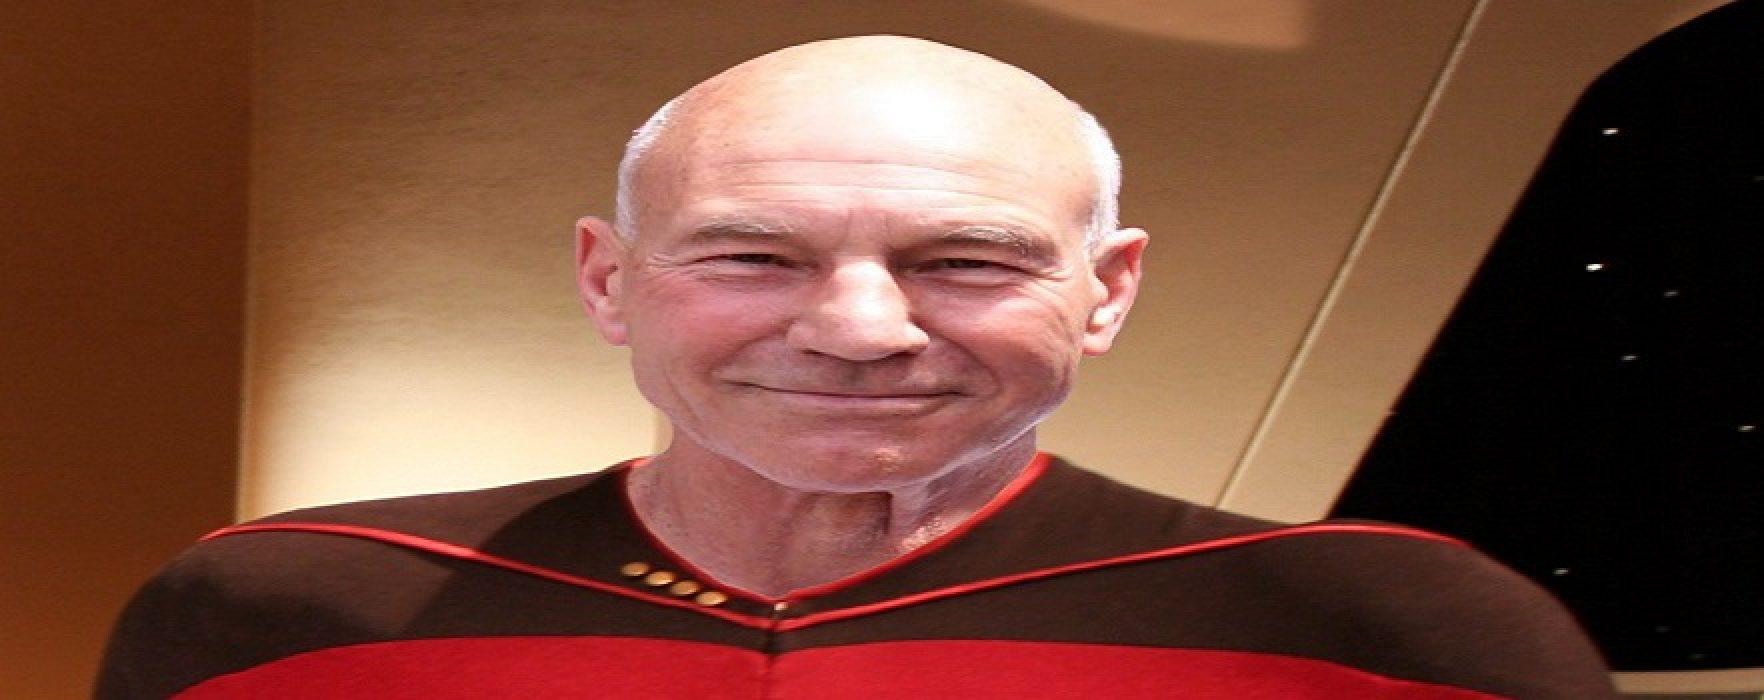 Picard Returns in New Star Trek Series